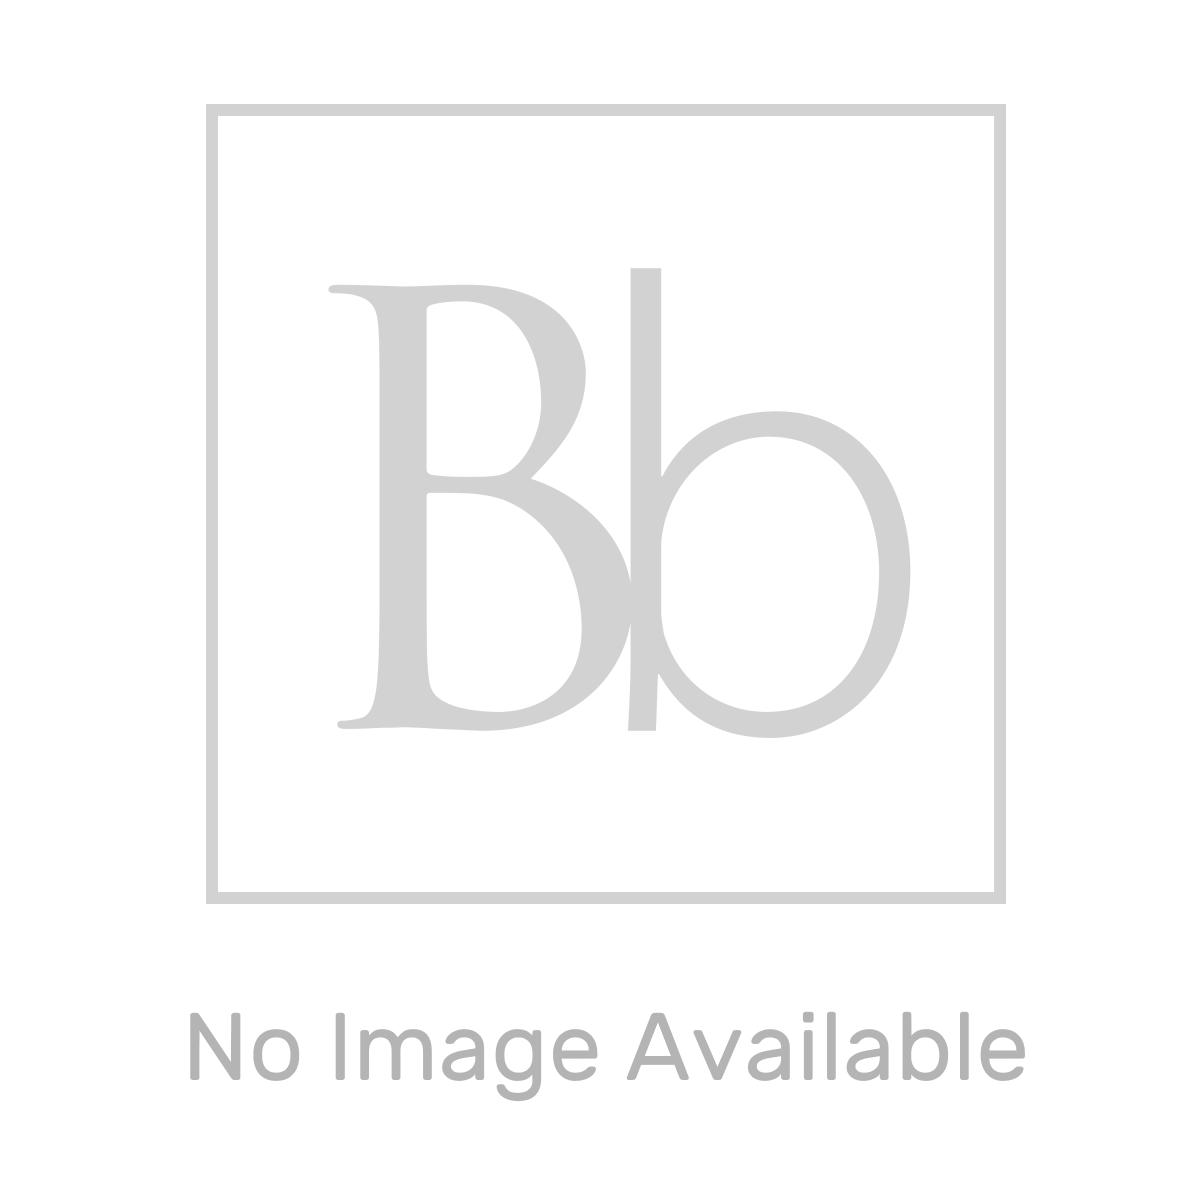 Sensio Nimbus Cool White Round Plinth Light 6 x Kit Inc Driver 4